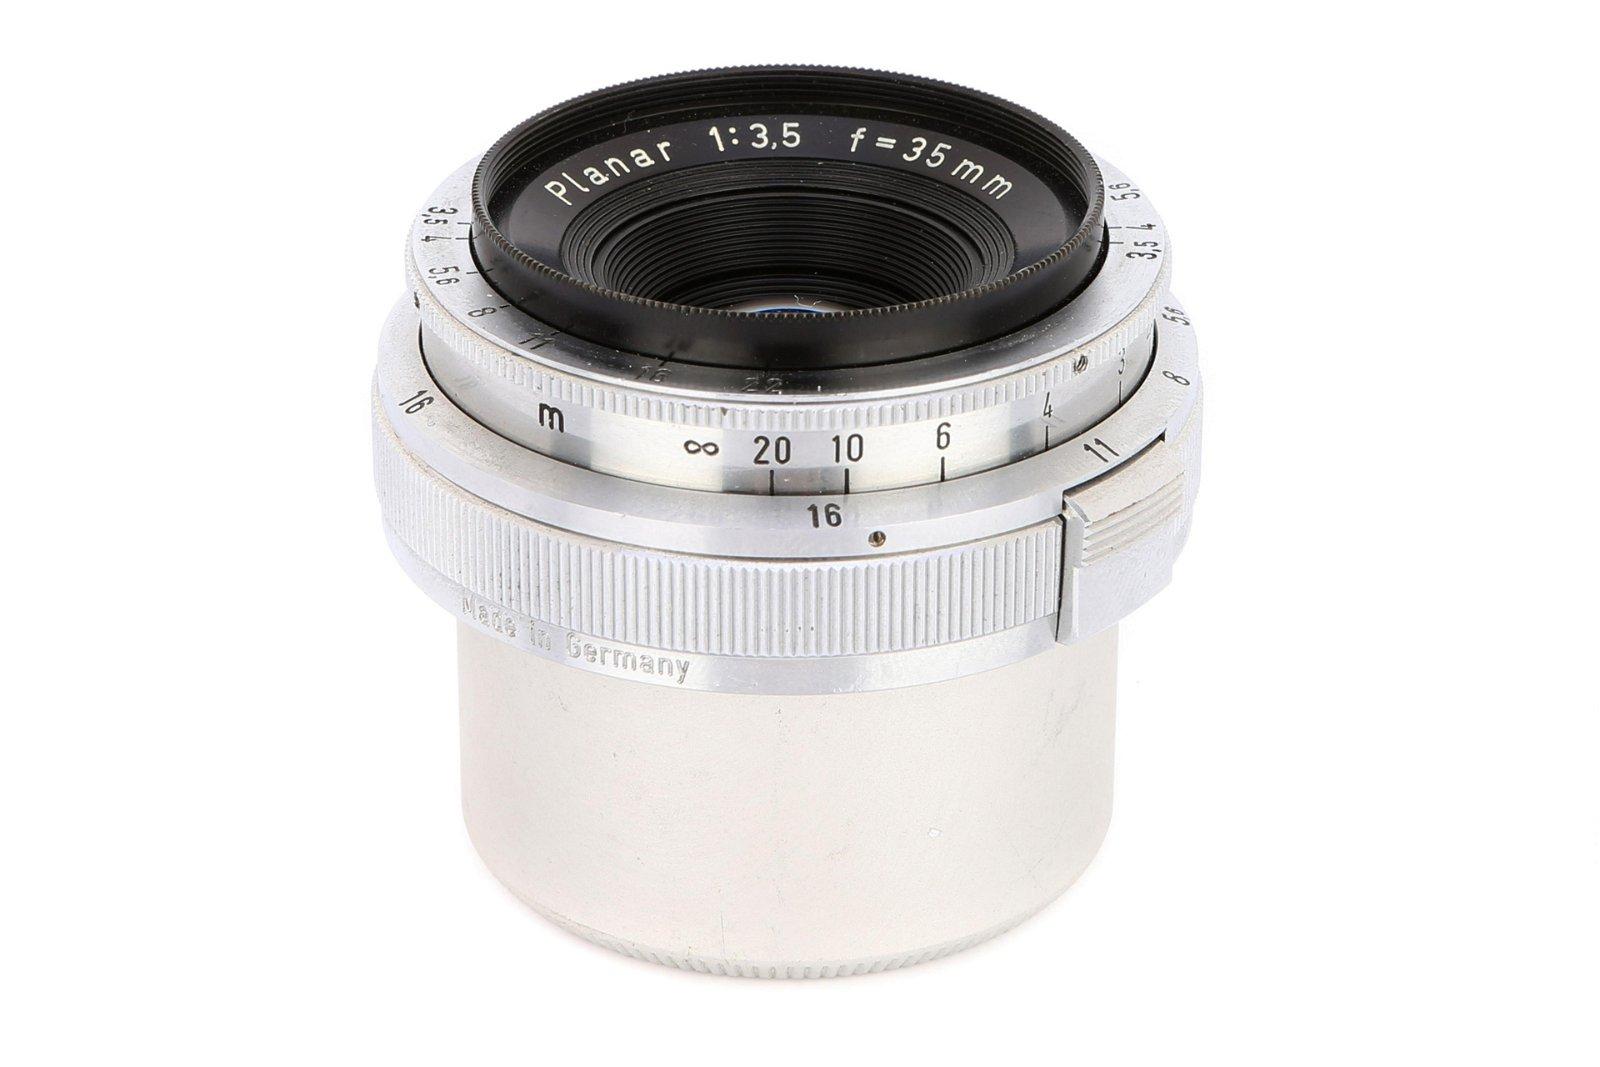 * A Carl Zeiss Planar f/3.5 35mm Lens,